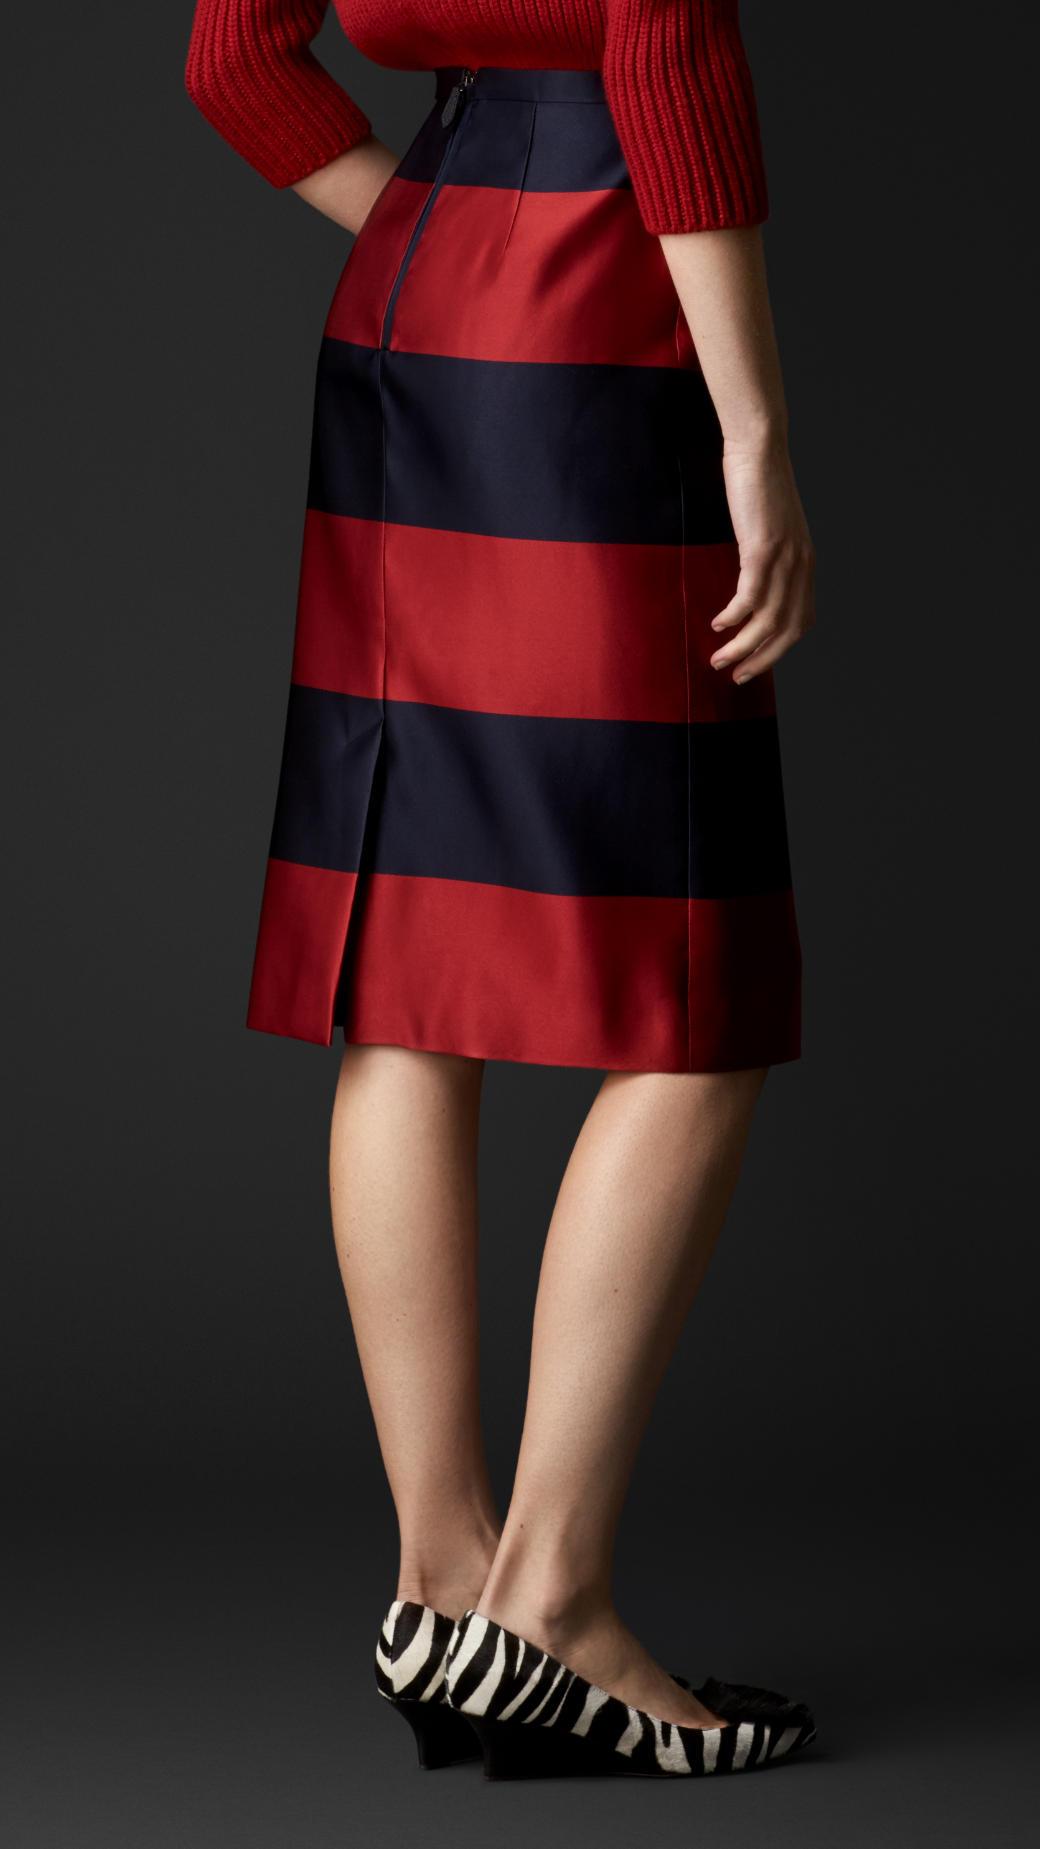 Lyst Burberry Duchess Silk Satin Pencil Skirt In Red